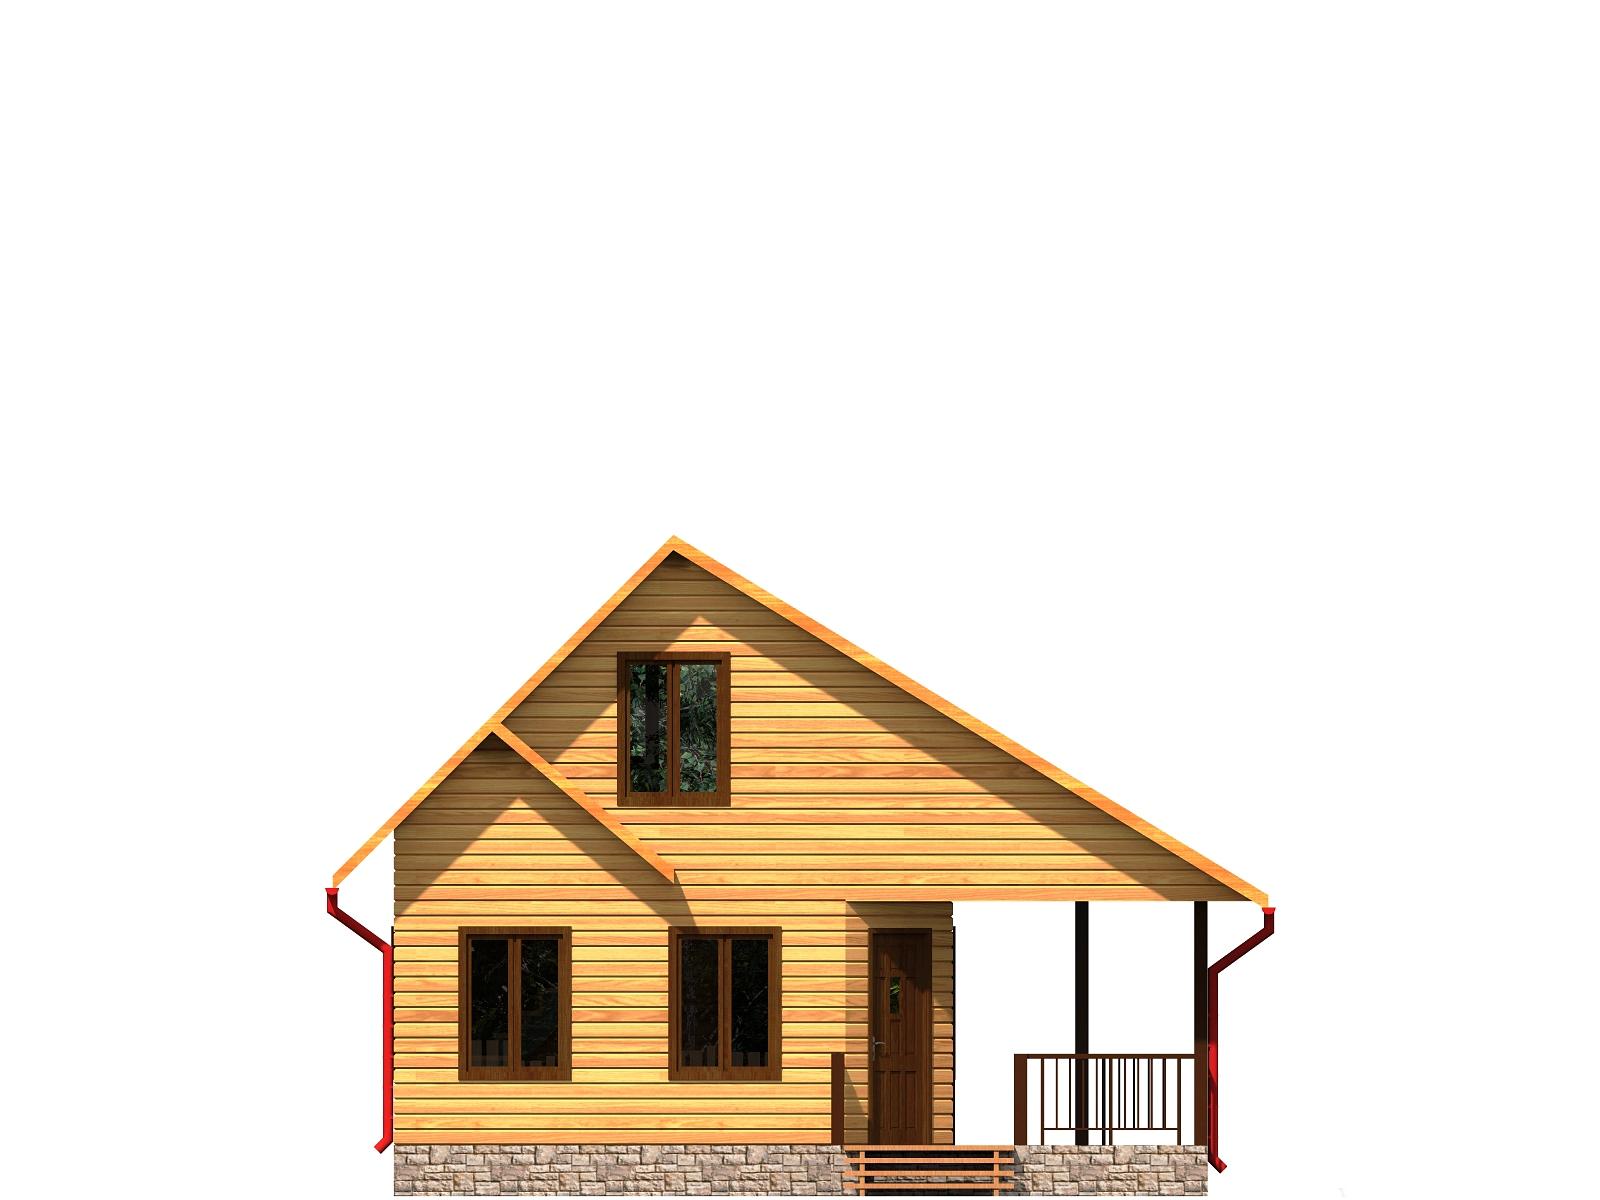 Проект дома из бруса 6,7х8 с мансардой. Разрез 1.